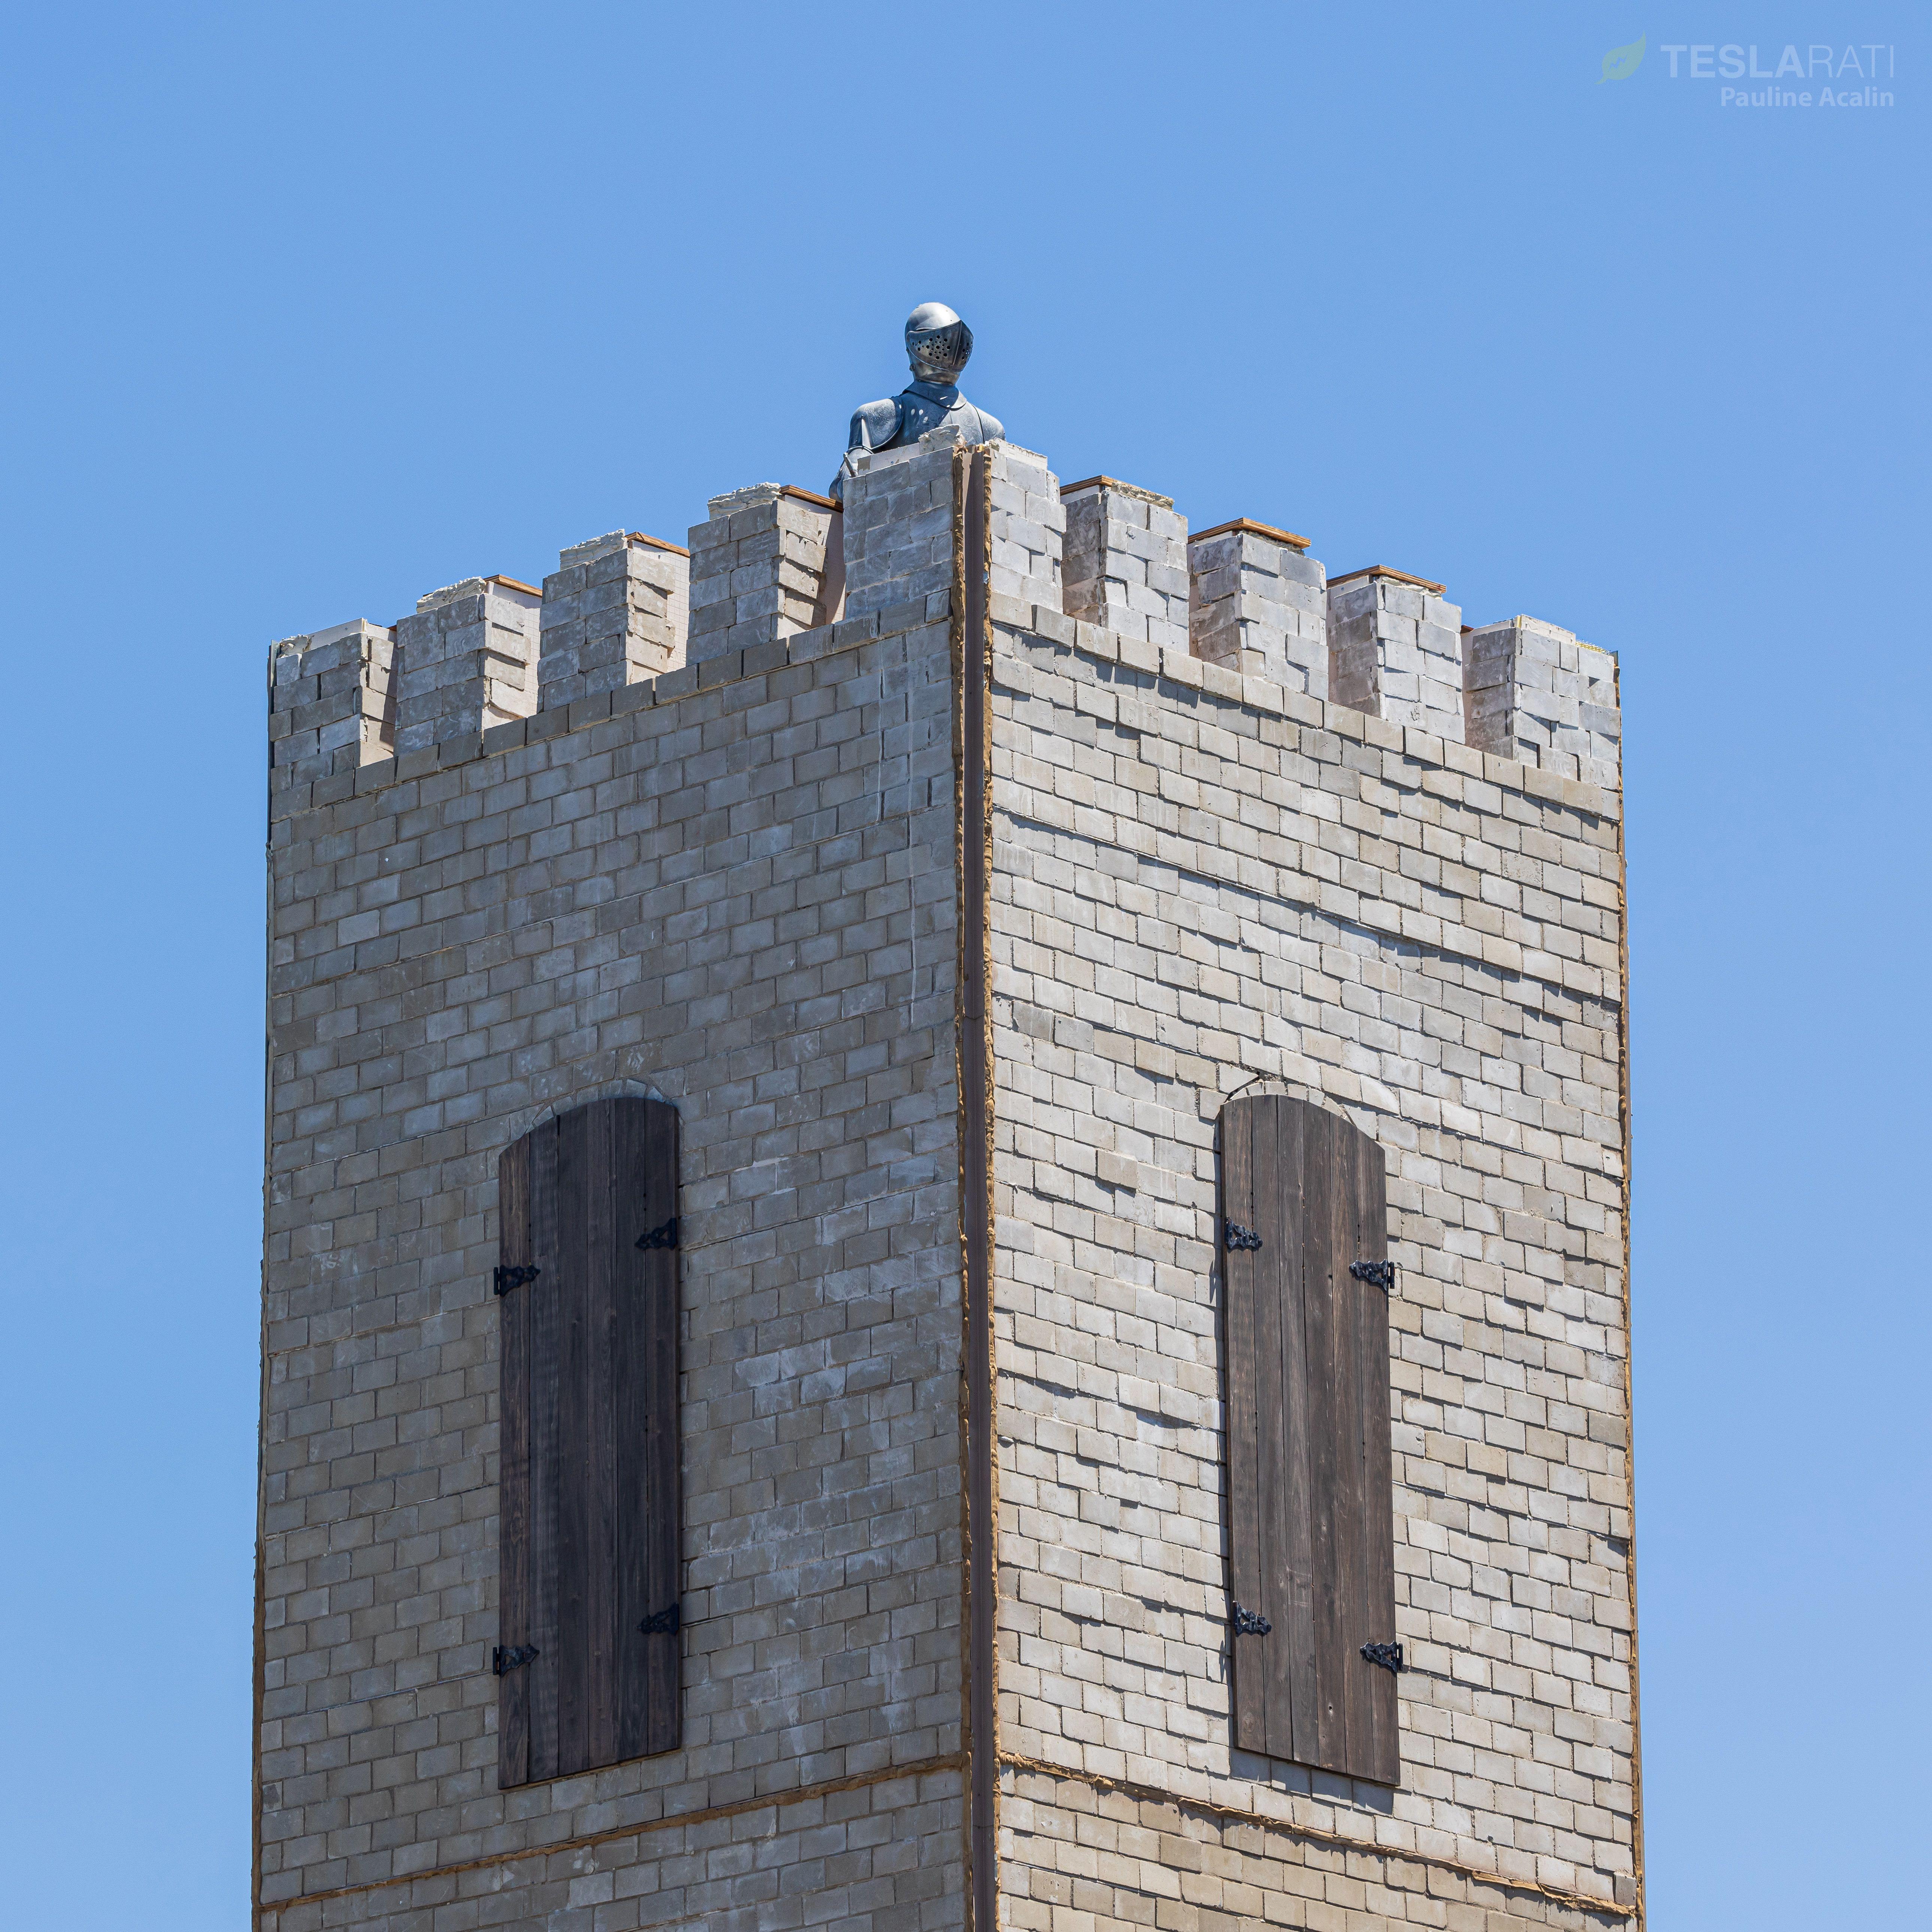 TBM-tower-knight-Pauline-Acalin-0519-4